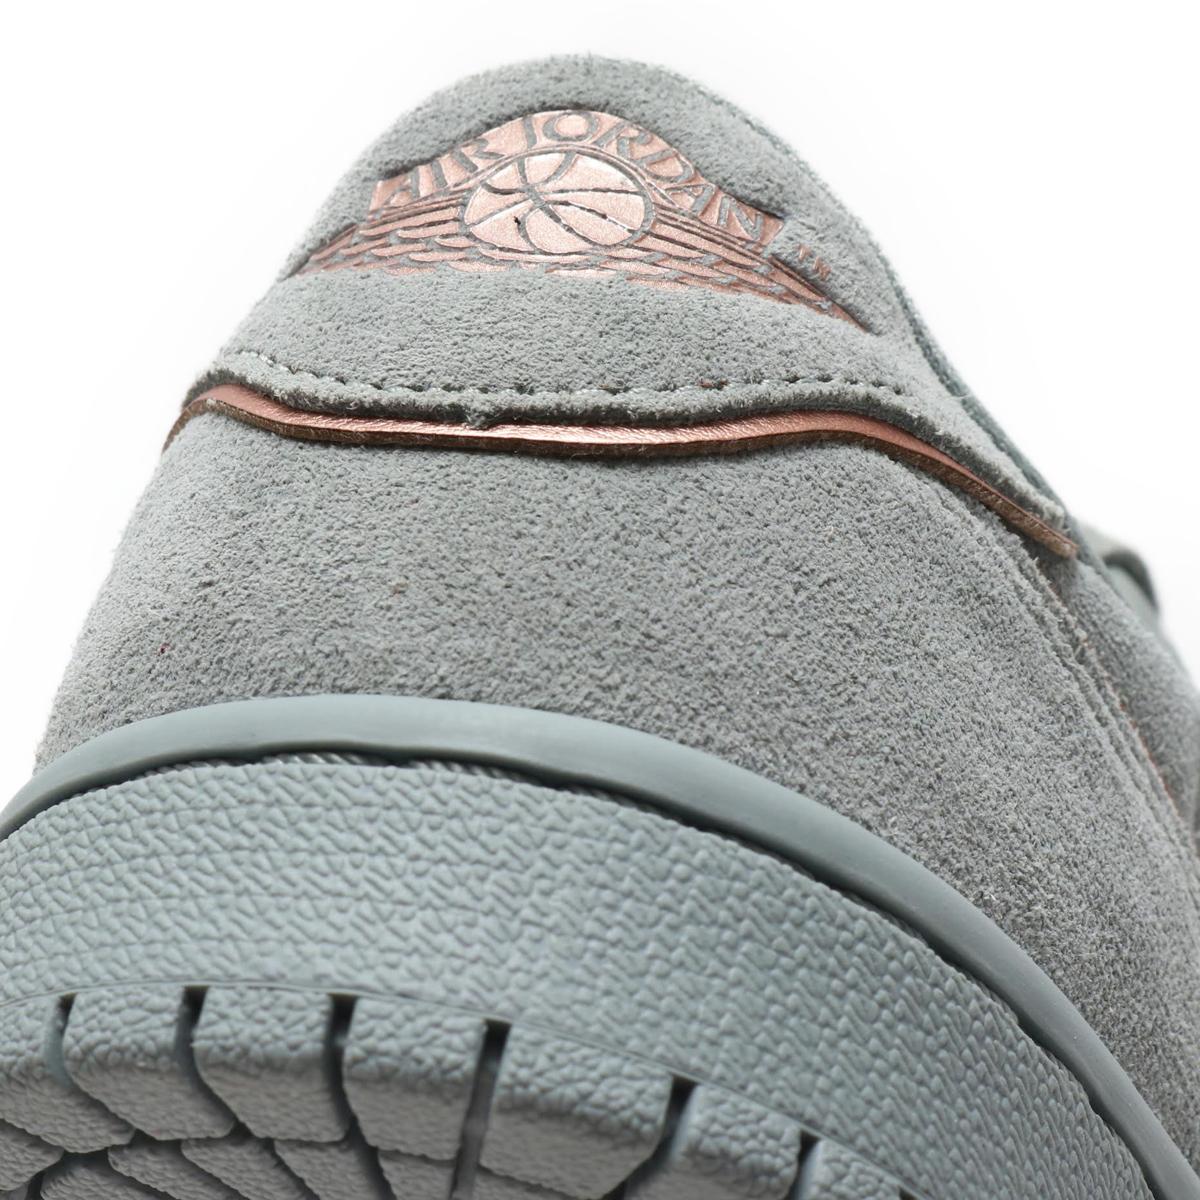 965138a8156eb0 NIKE WMNS AIR JORDAN 1 RETRO LOW NS (Nike women Air Jordan 1 nostalgic low  NS) (MICA GREEN MTLC RED BRONZE) 18SU-S